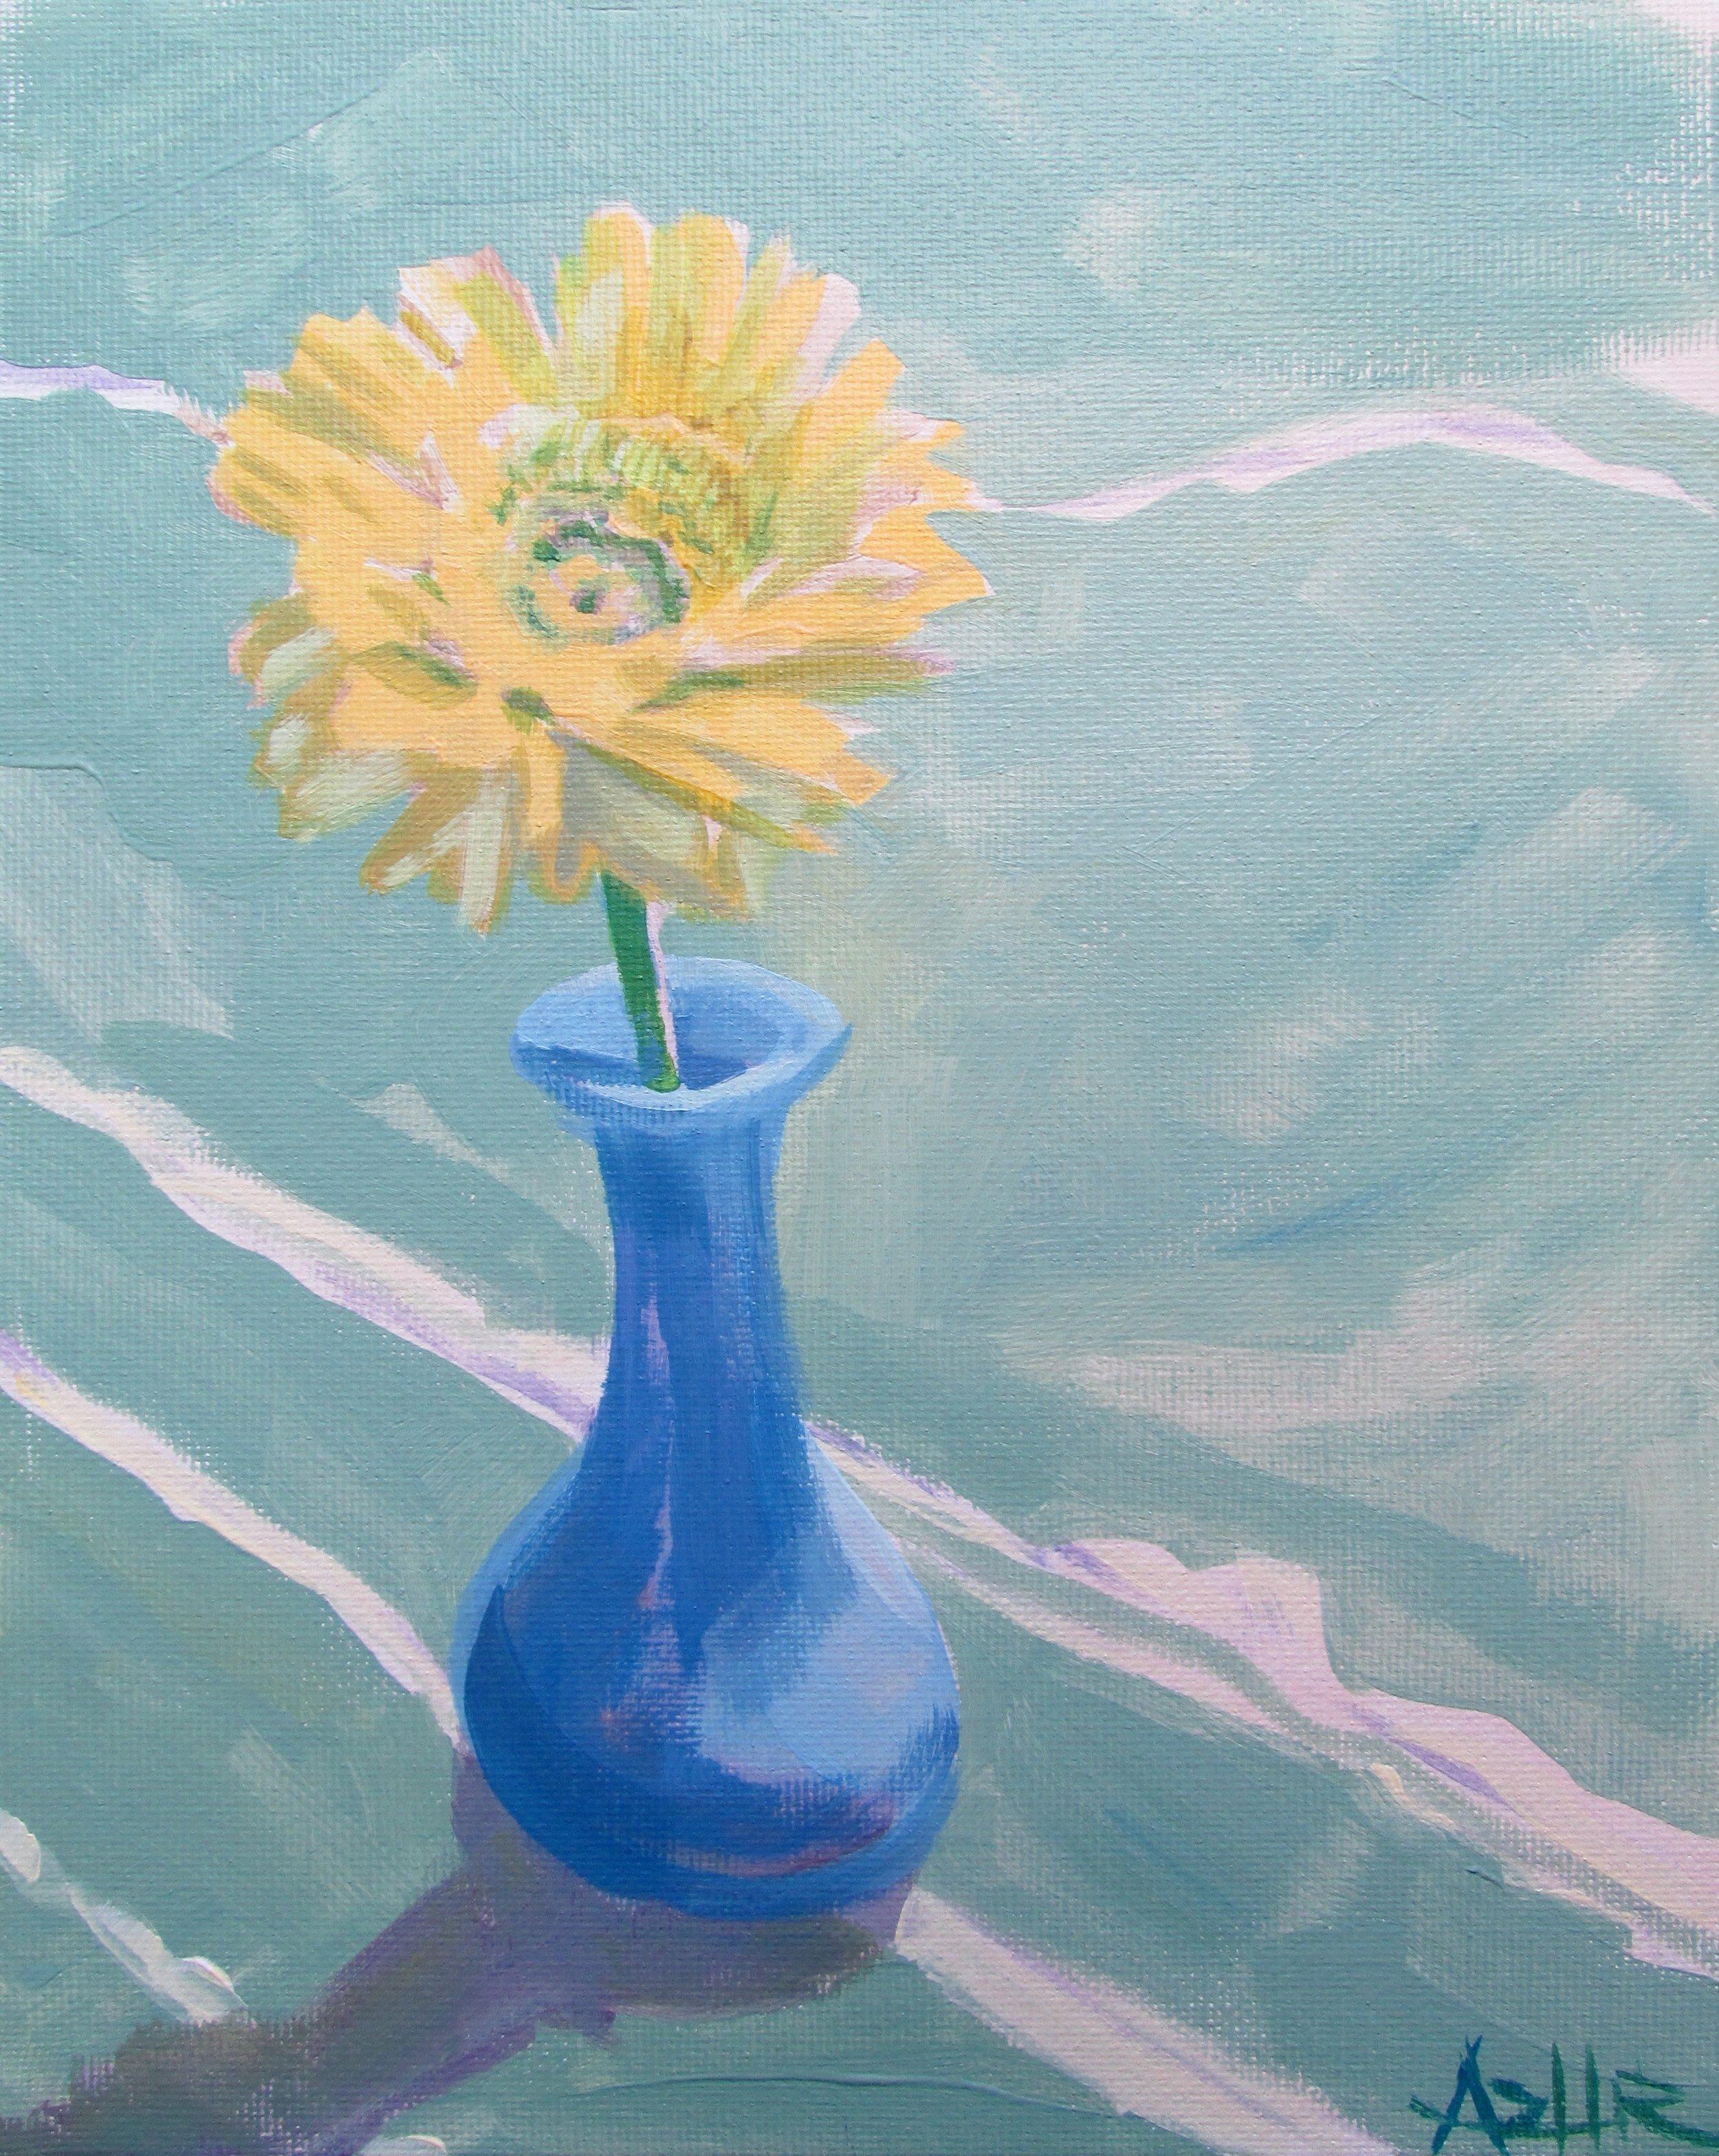 "SOLD, Sunshine in a Bottle, Copyright 2016 Hirschten, Oil on Canvas, 8"" x 10"""